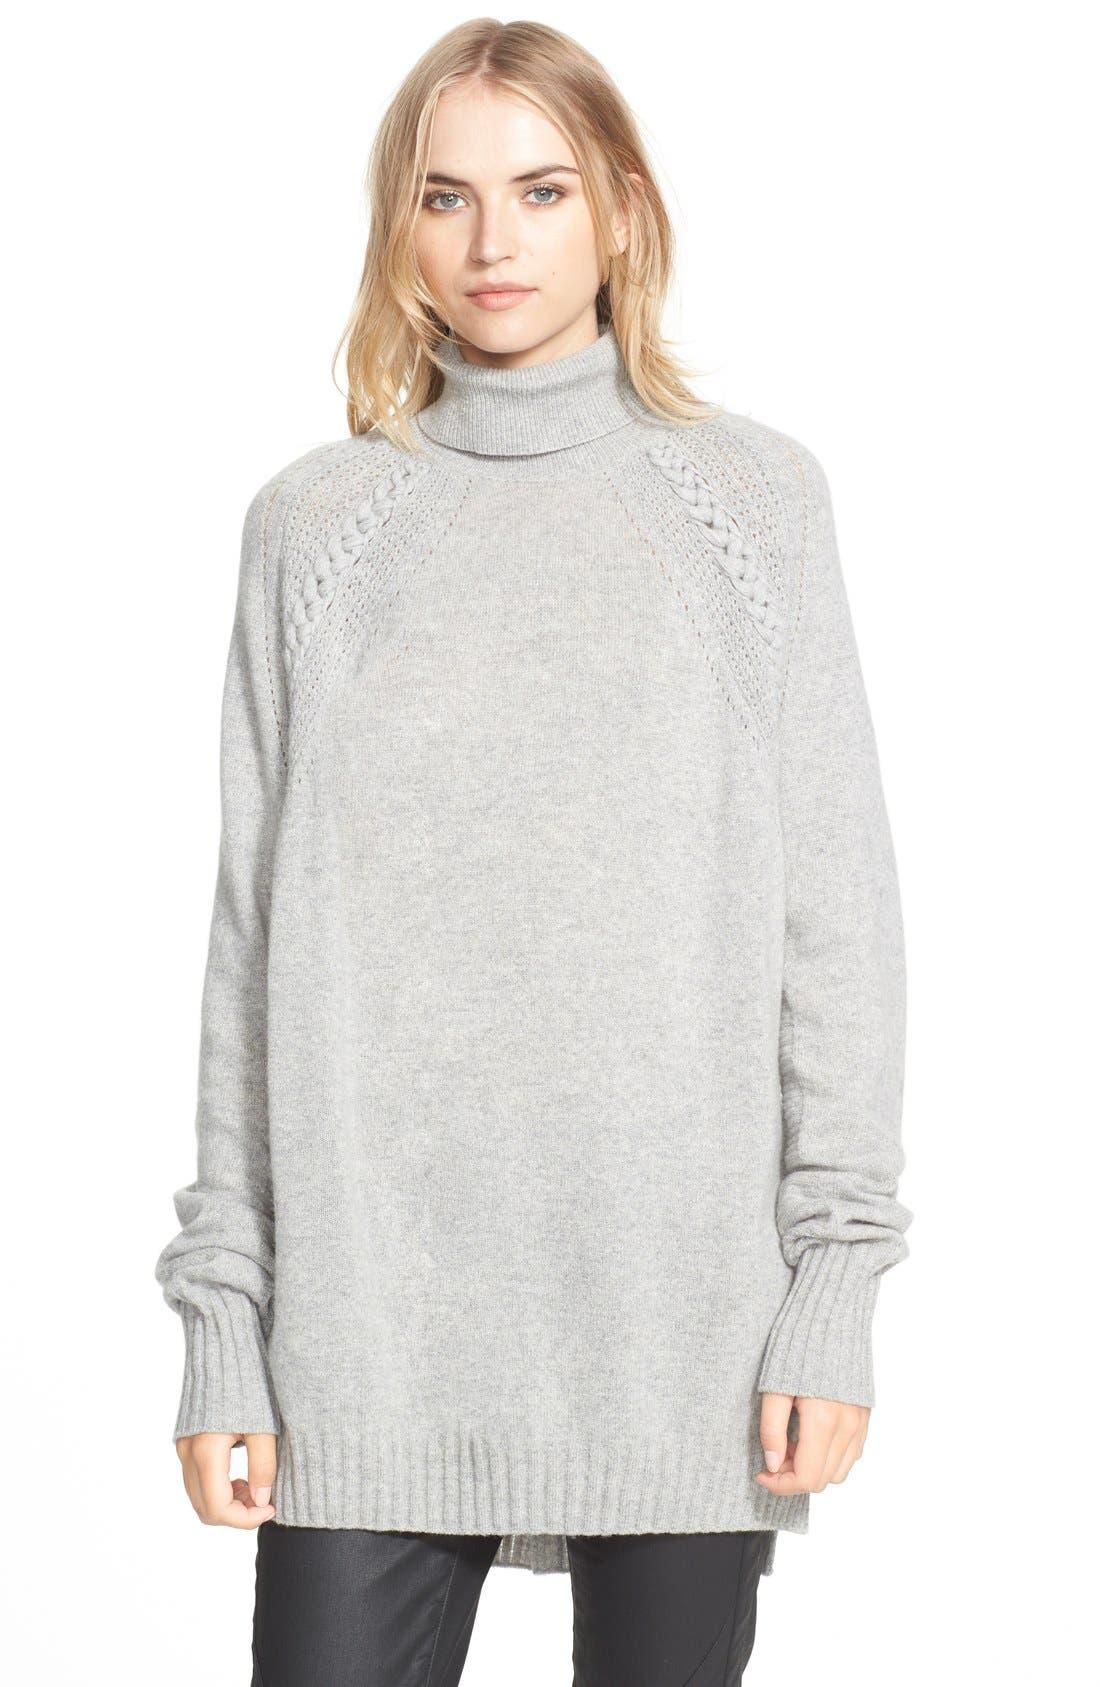 Alternate Image 1 Selected - Belstaff Wool & Cashmere Turtleneck Sweater